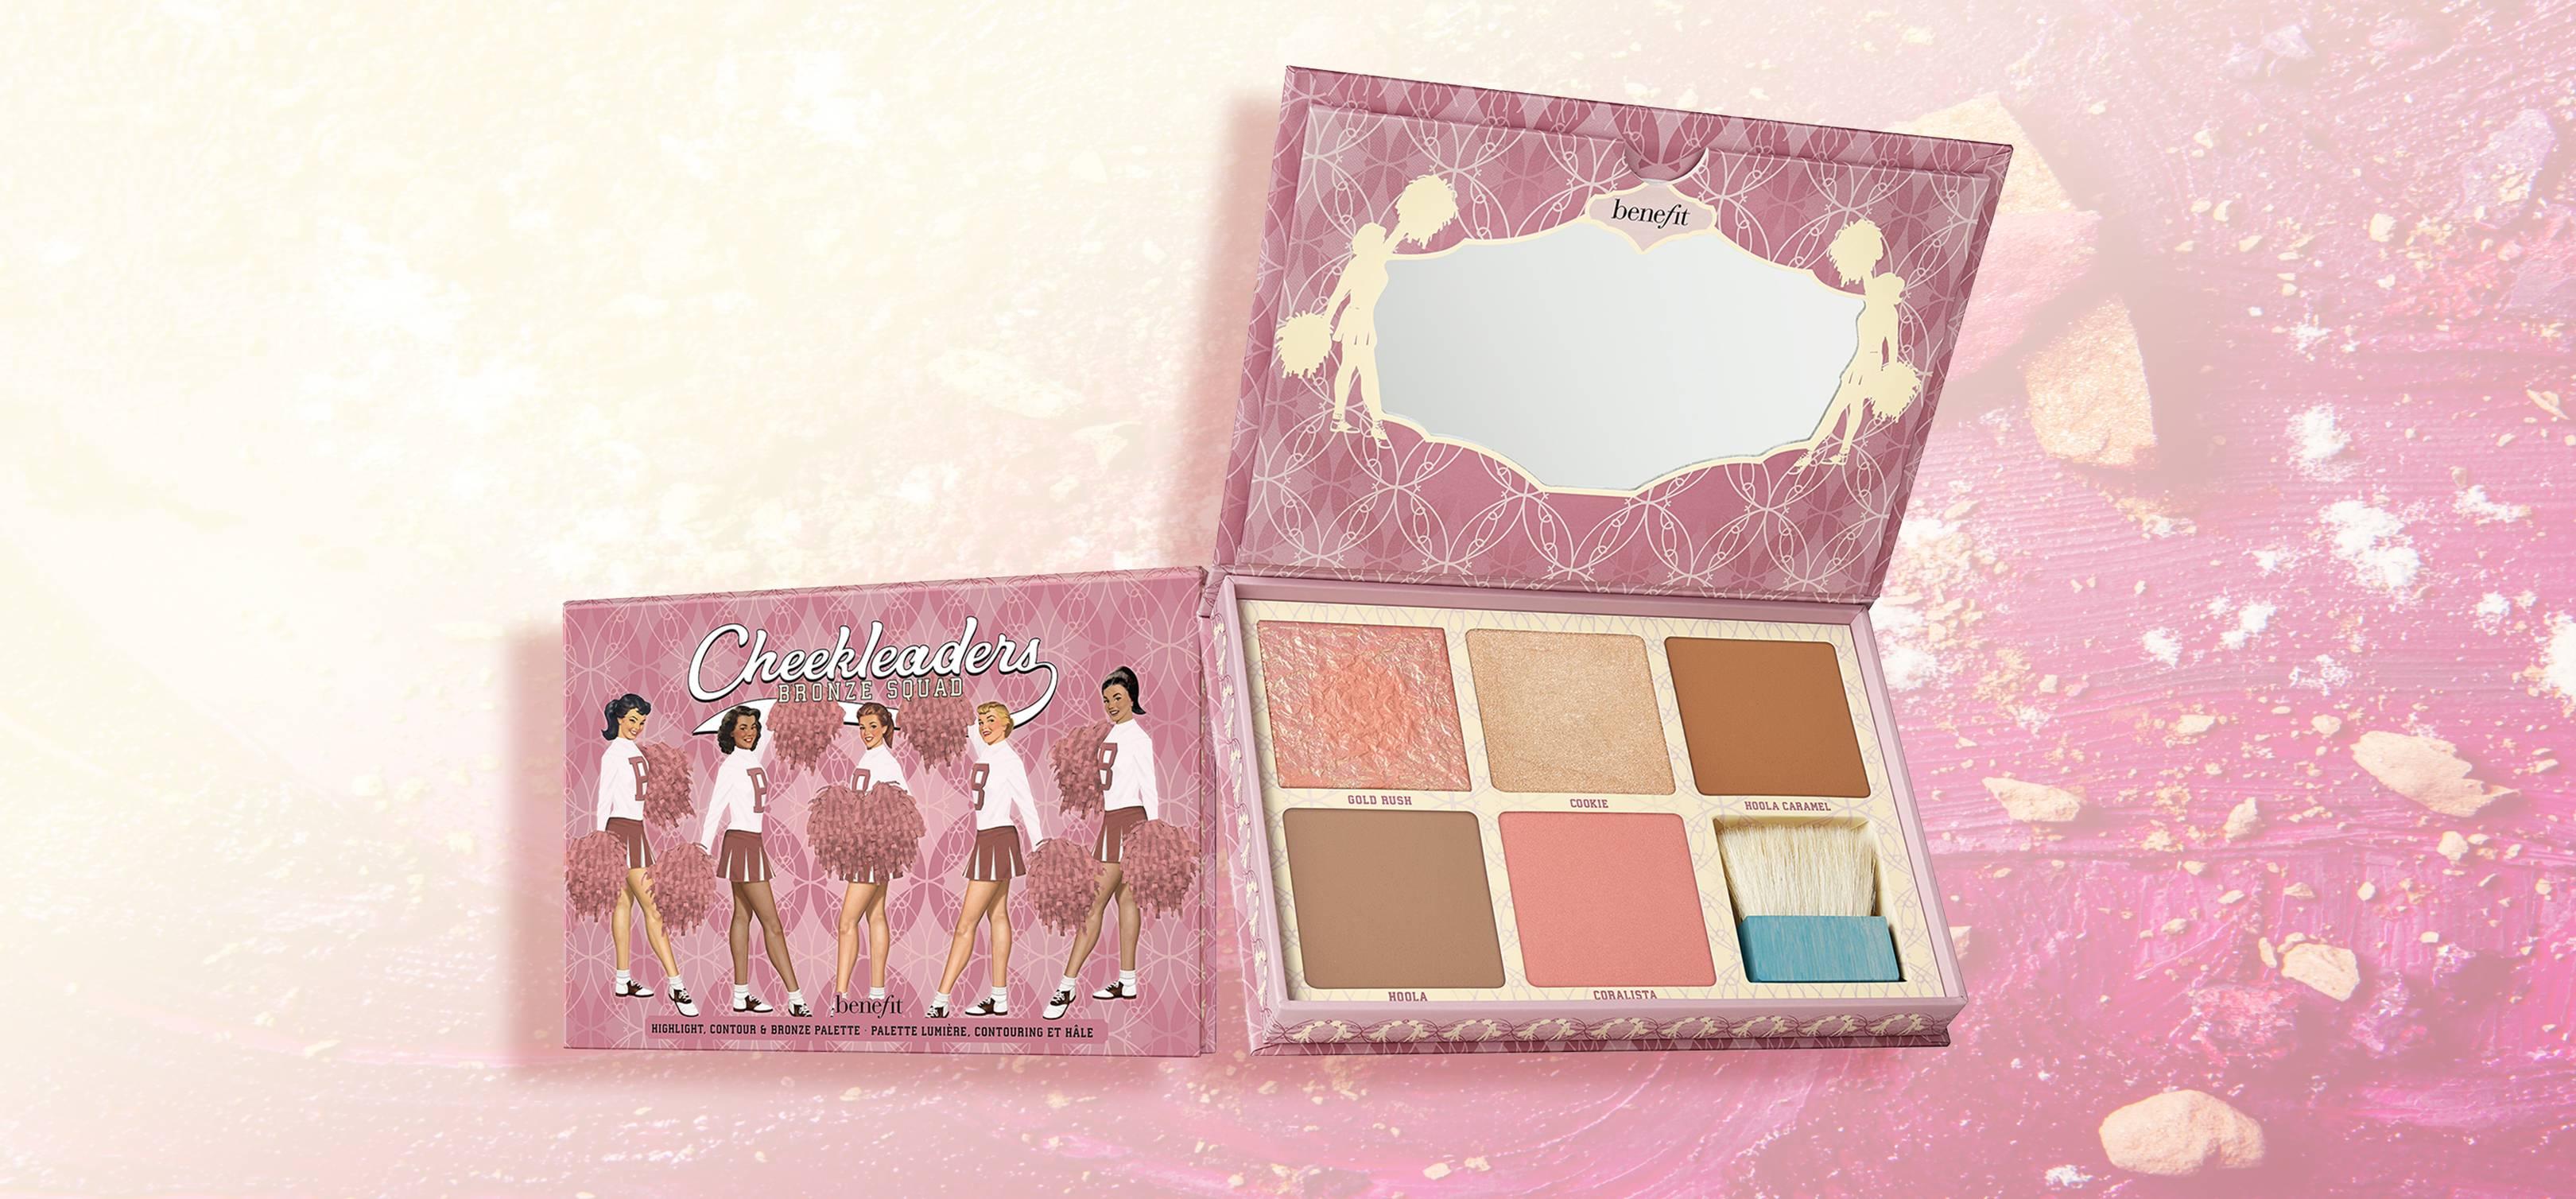 Cheekleaders Pink Squad Mini Cheek Palette by Benefit #15